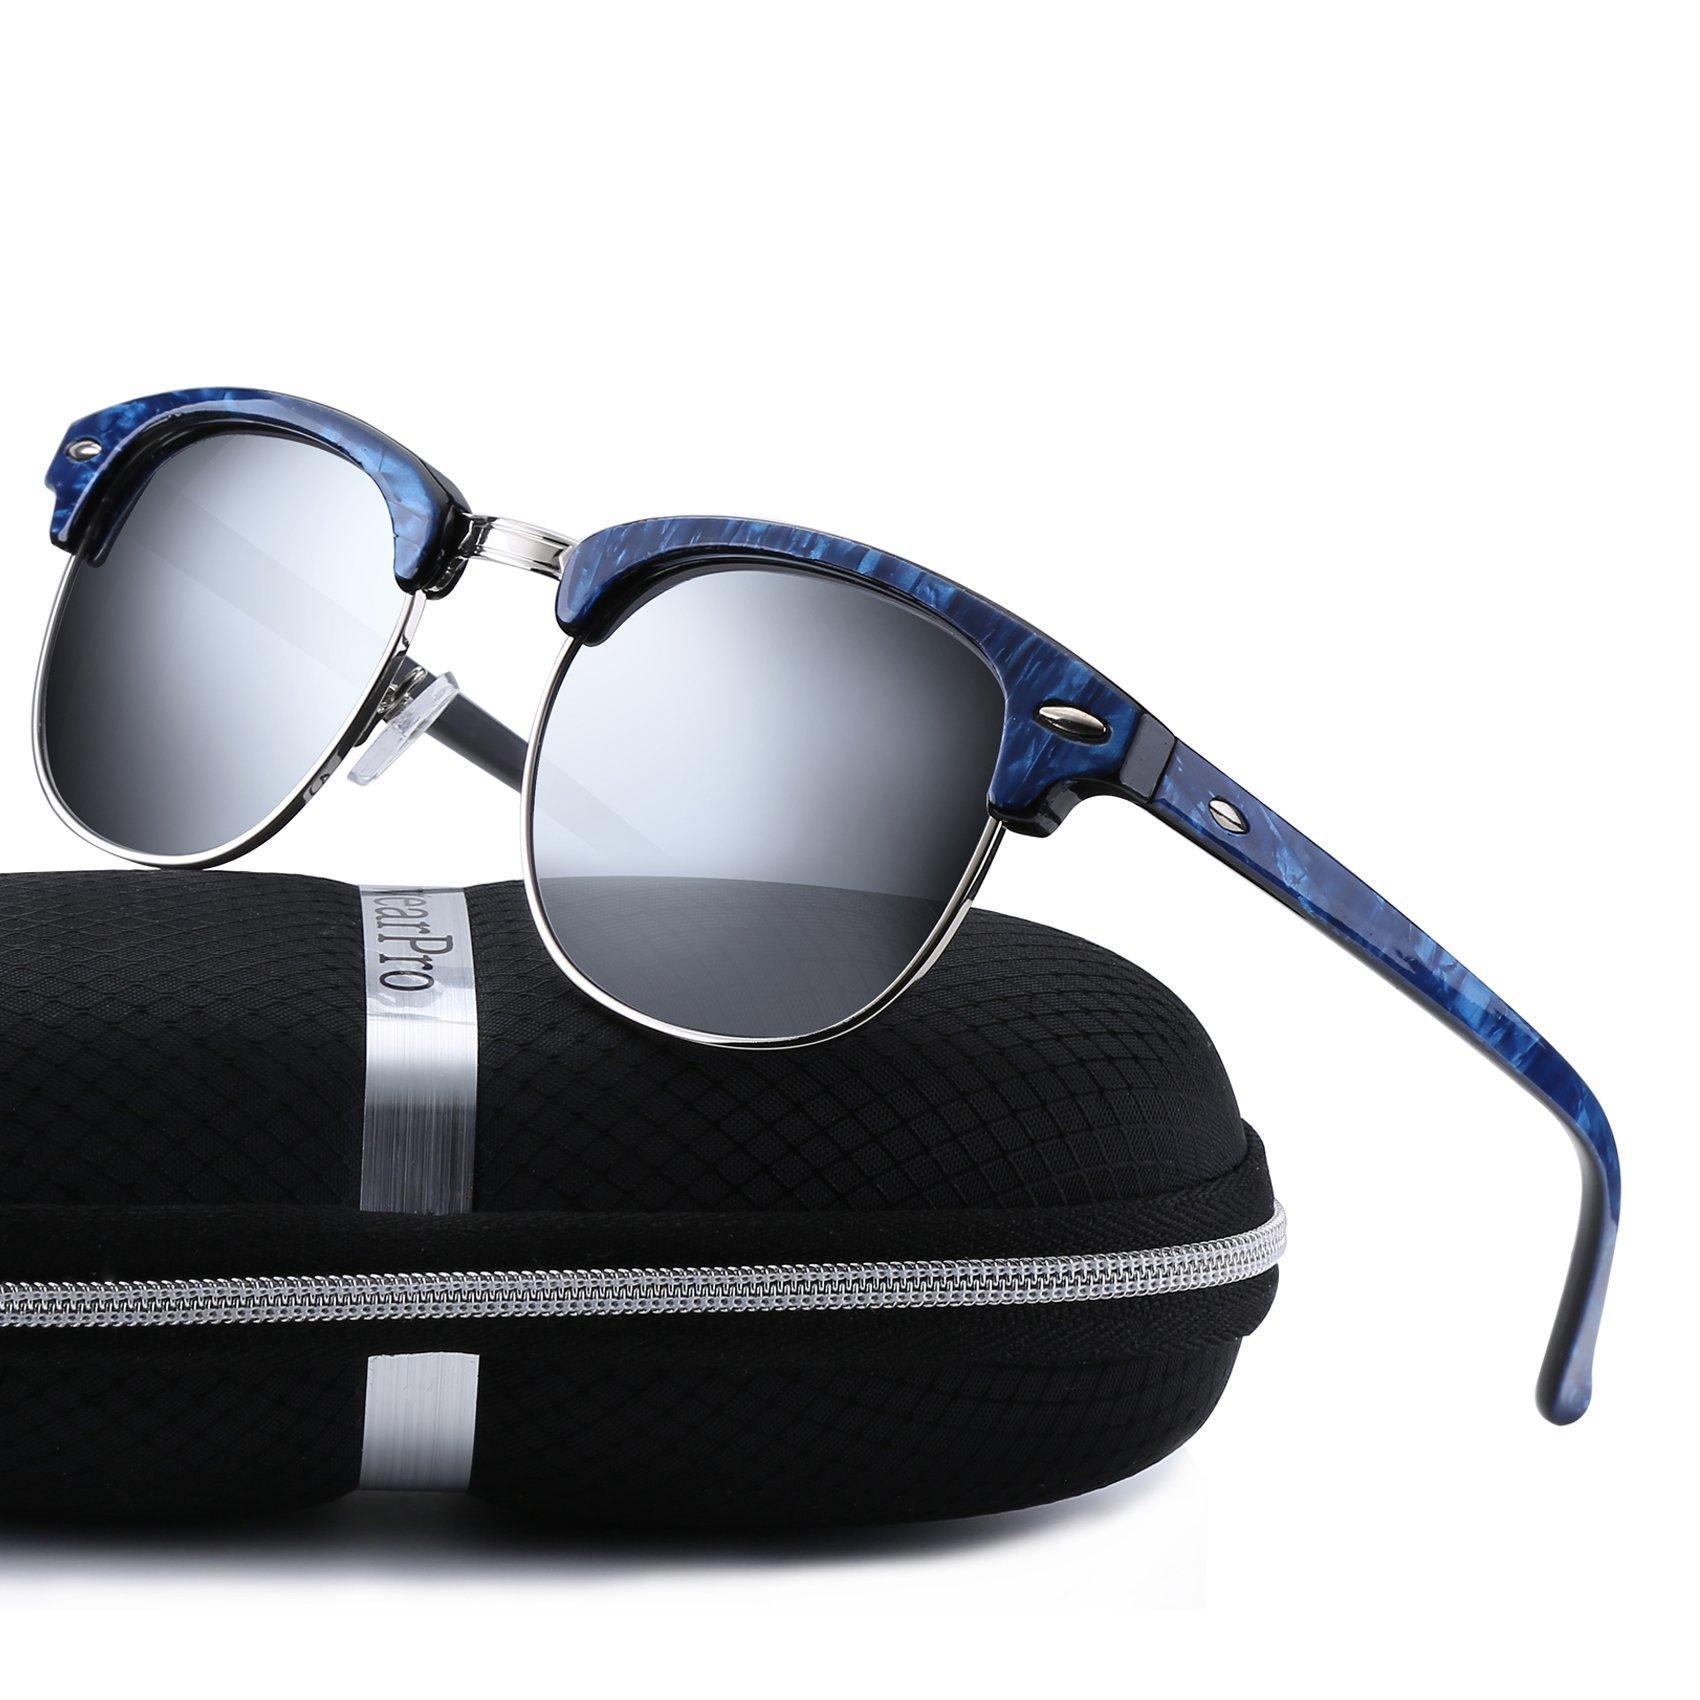 49276614953 Get Quotations · Clubmaster Sunglasses for Men Women - wearPro Retro Semi-Rimless  Polarized Sun Glasses WP1006